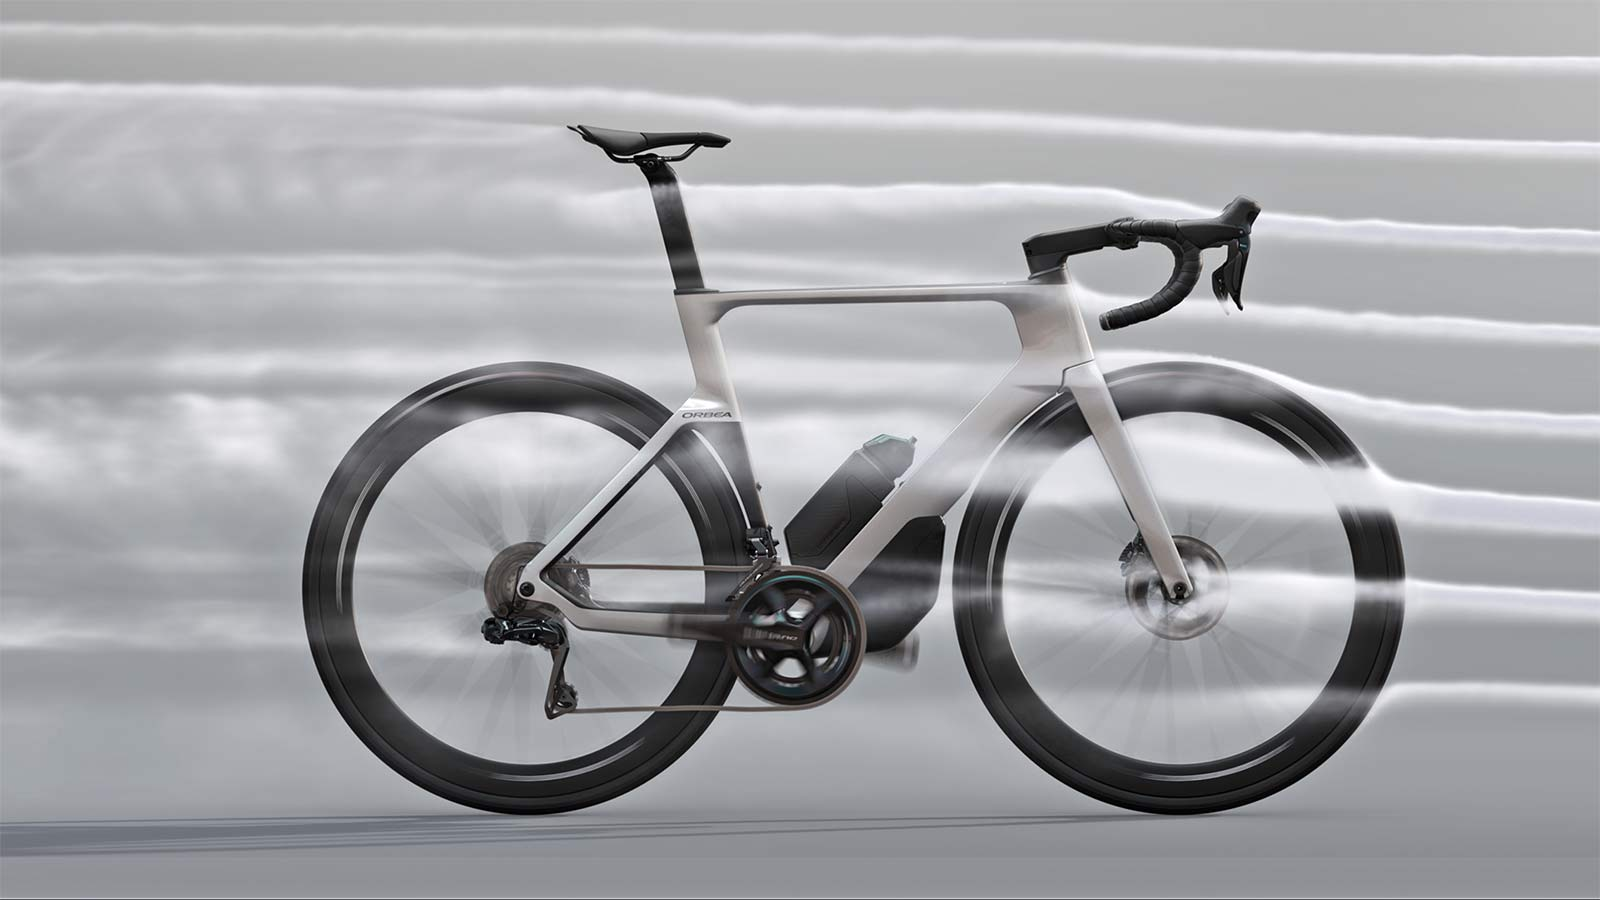 2022 Orbea Orca Aero carbon road bike, air flow